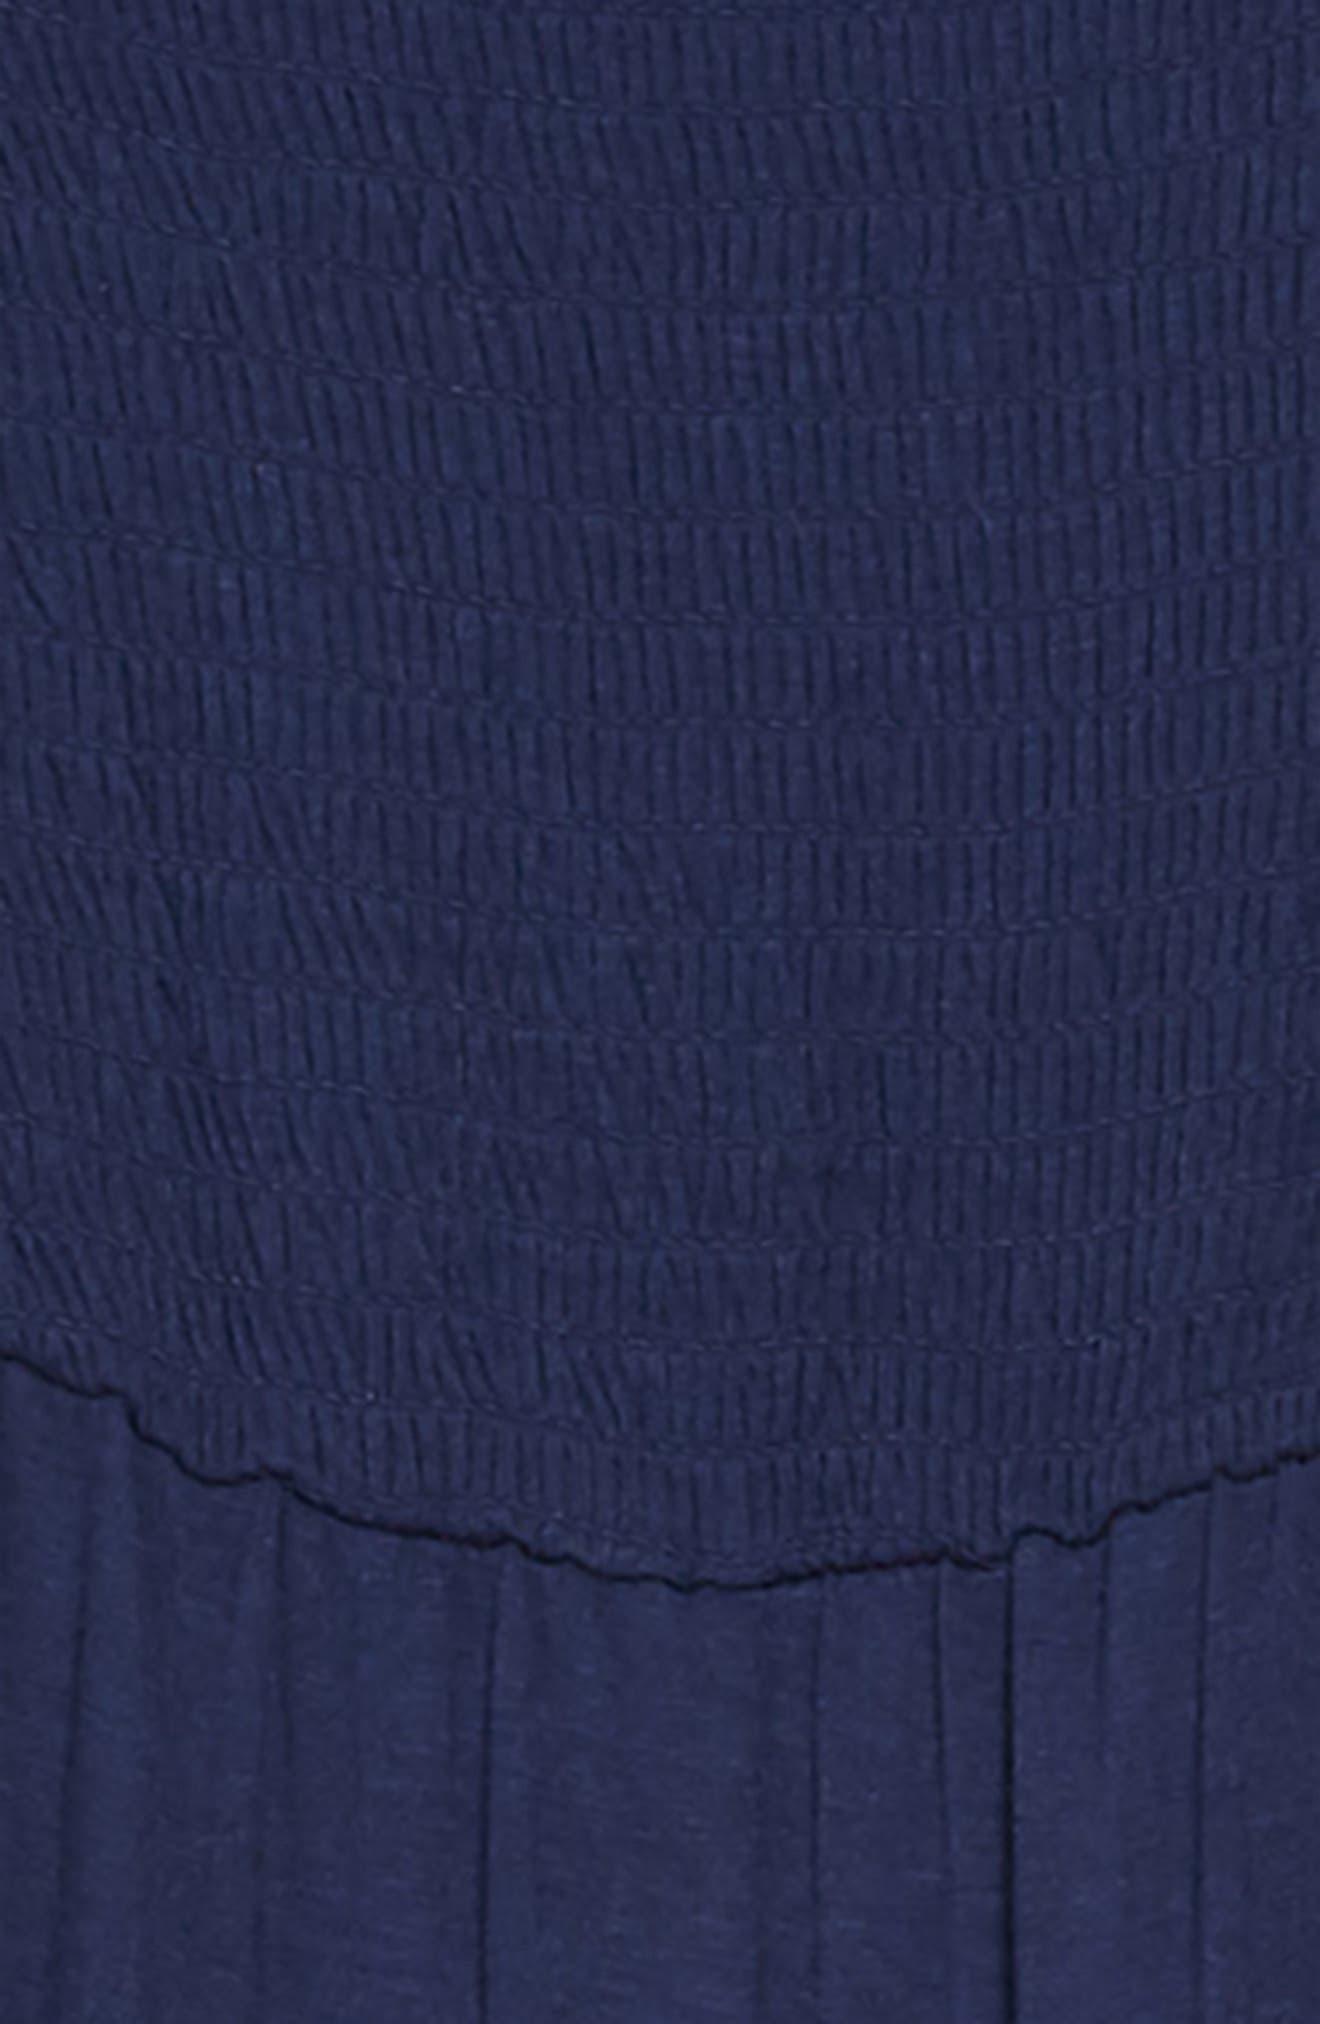 Off the Shoulder Knit Jumpsuit,                             Alternate thumbnail 2, color,                             400